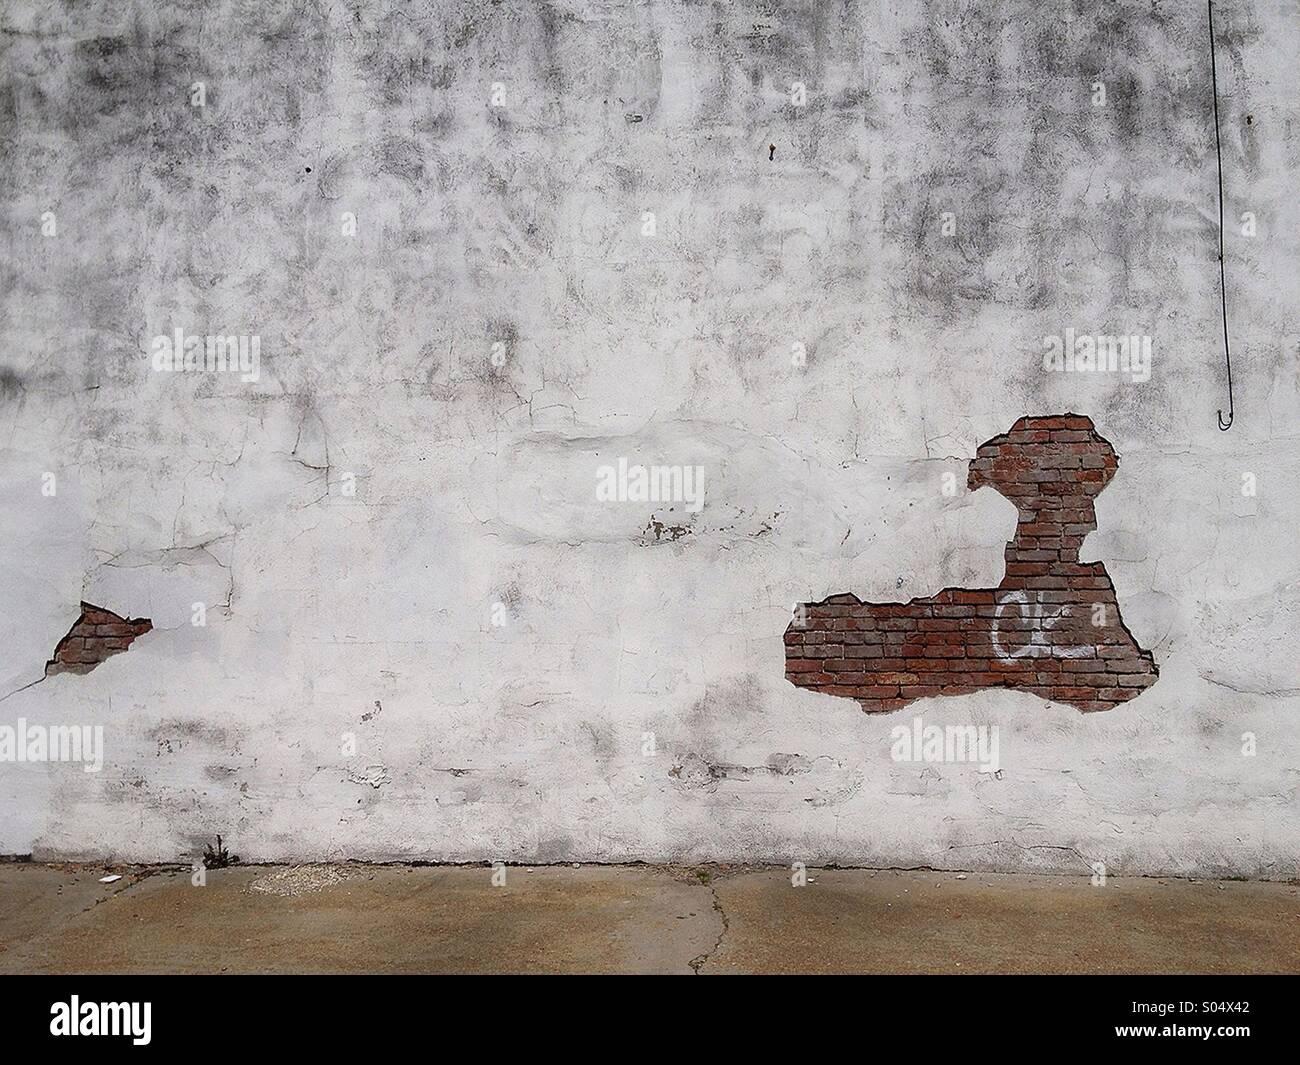 Urban street scene - Stock Image